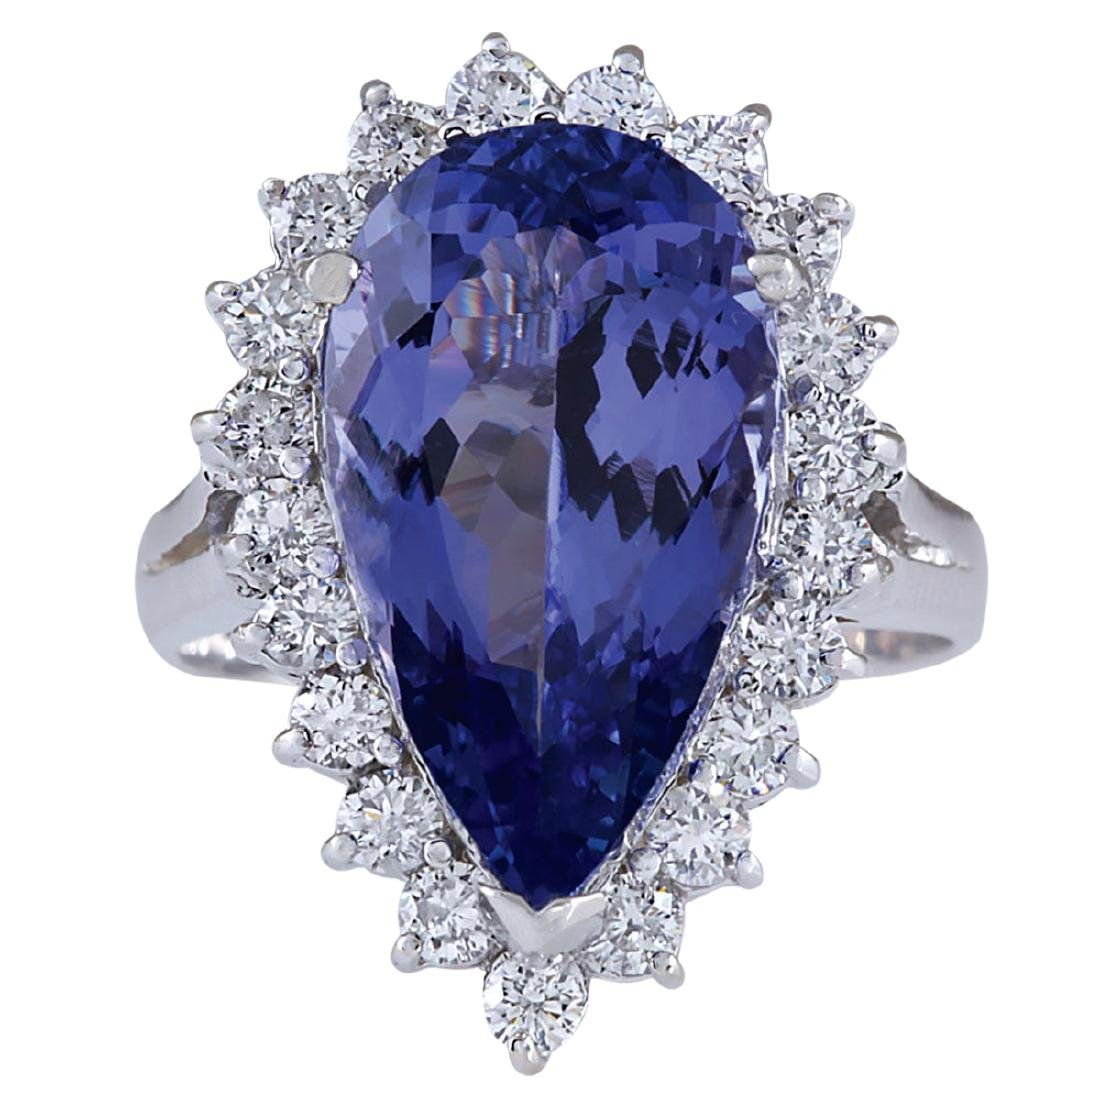 7.26CTW Natural Tanzanite And Diamond Ring In 18K White